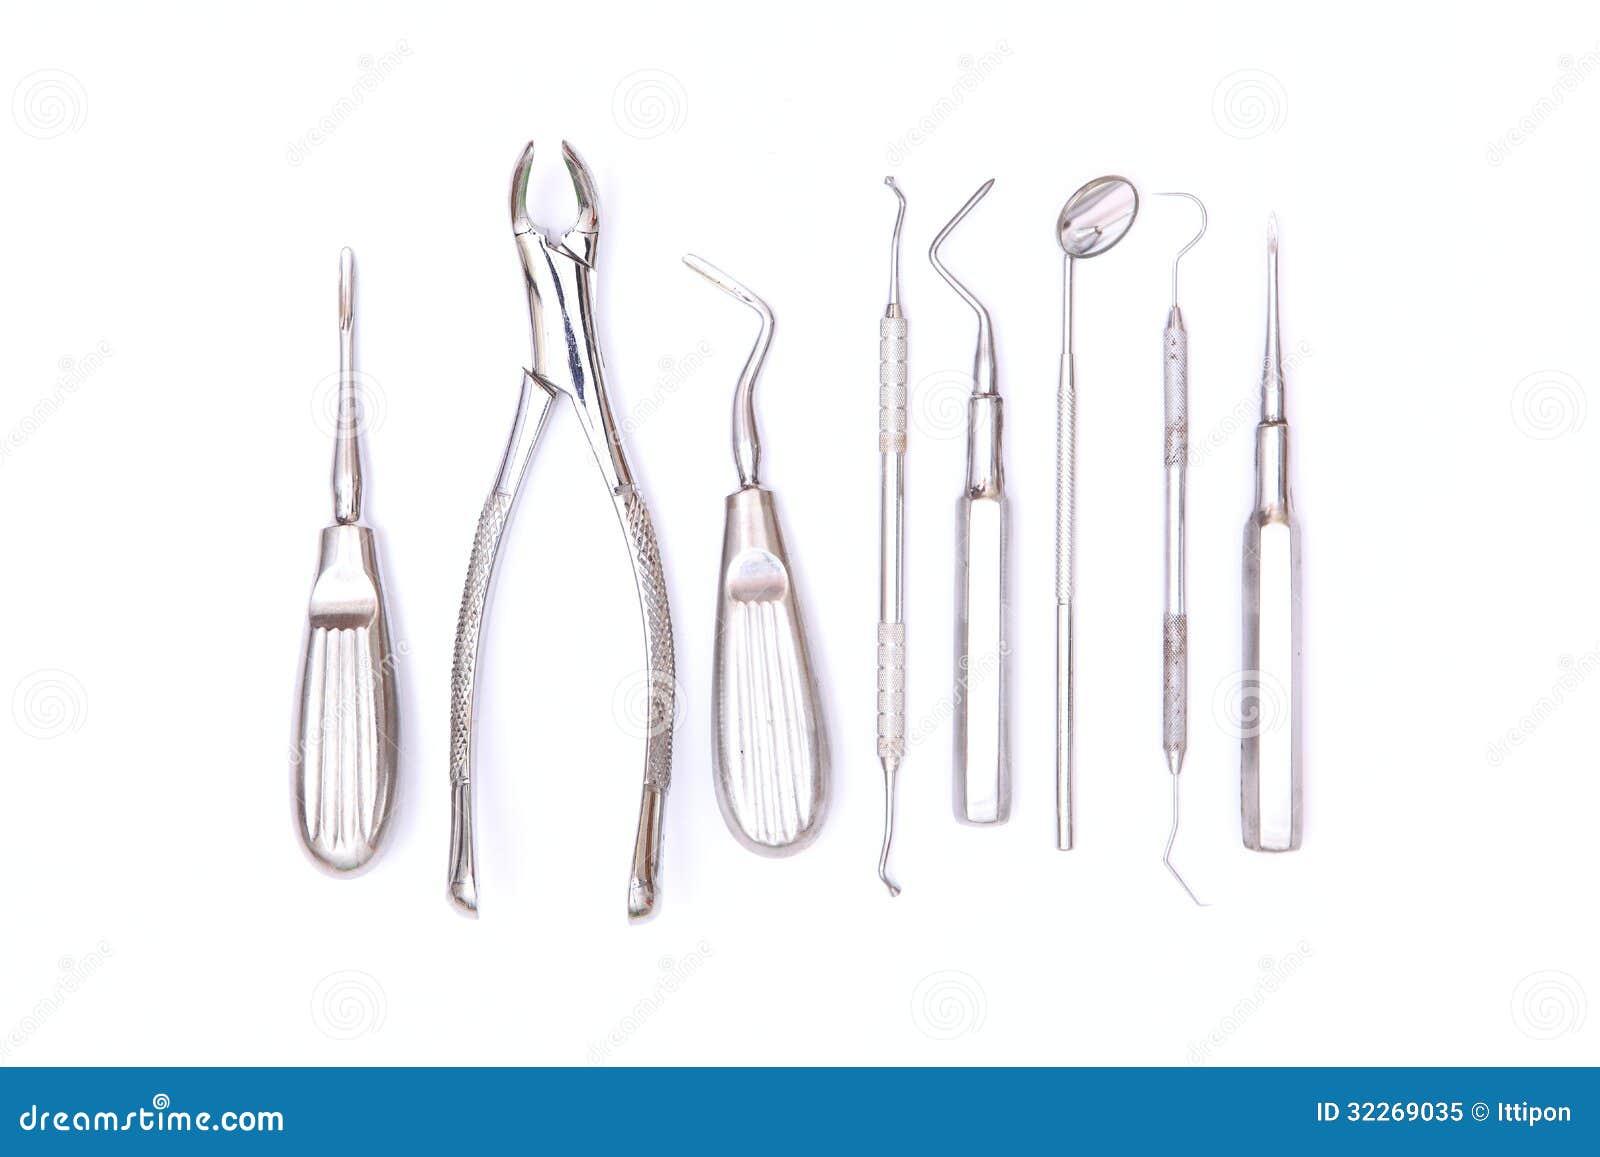 Dental Tools Royalty Free Stock Photo - Image: 32269035